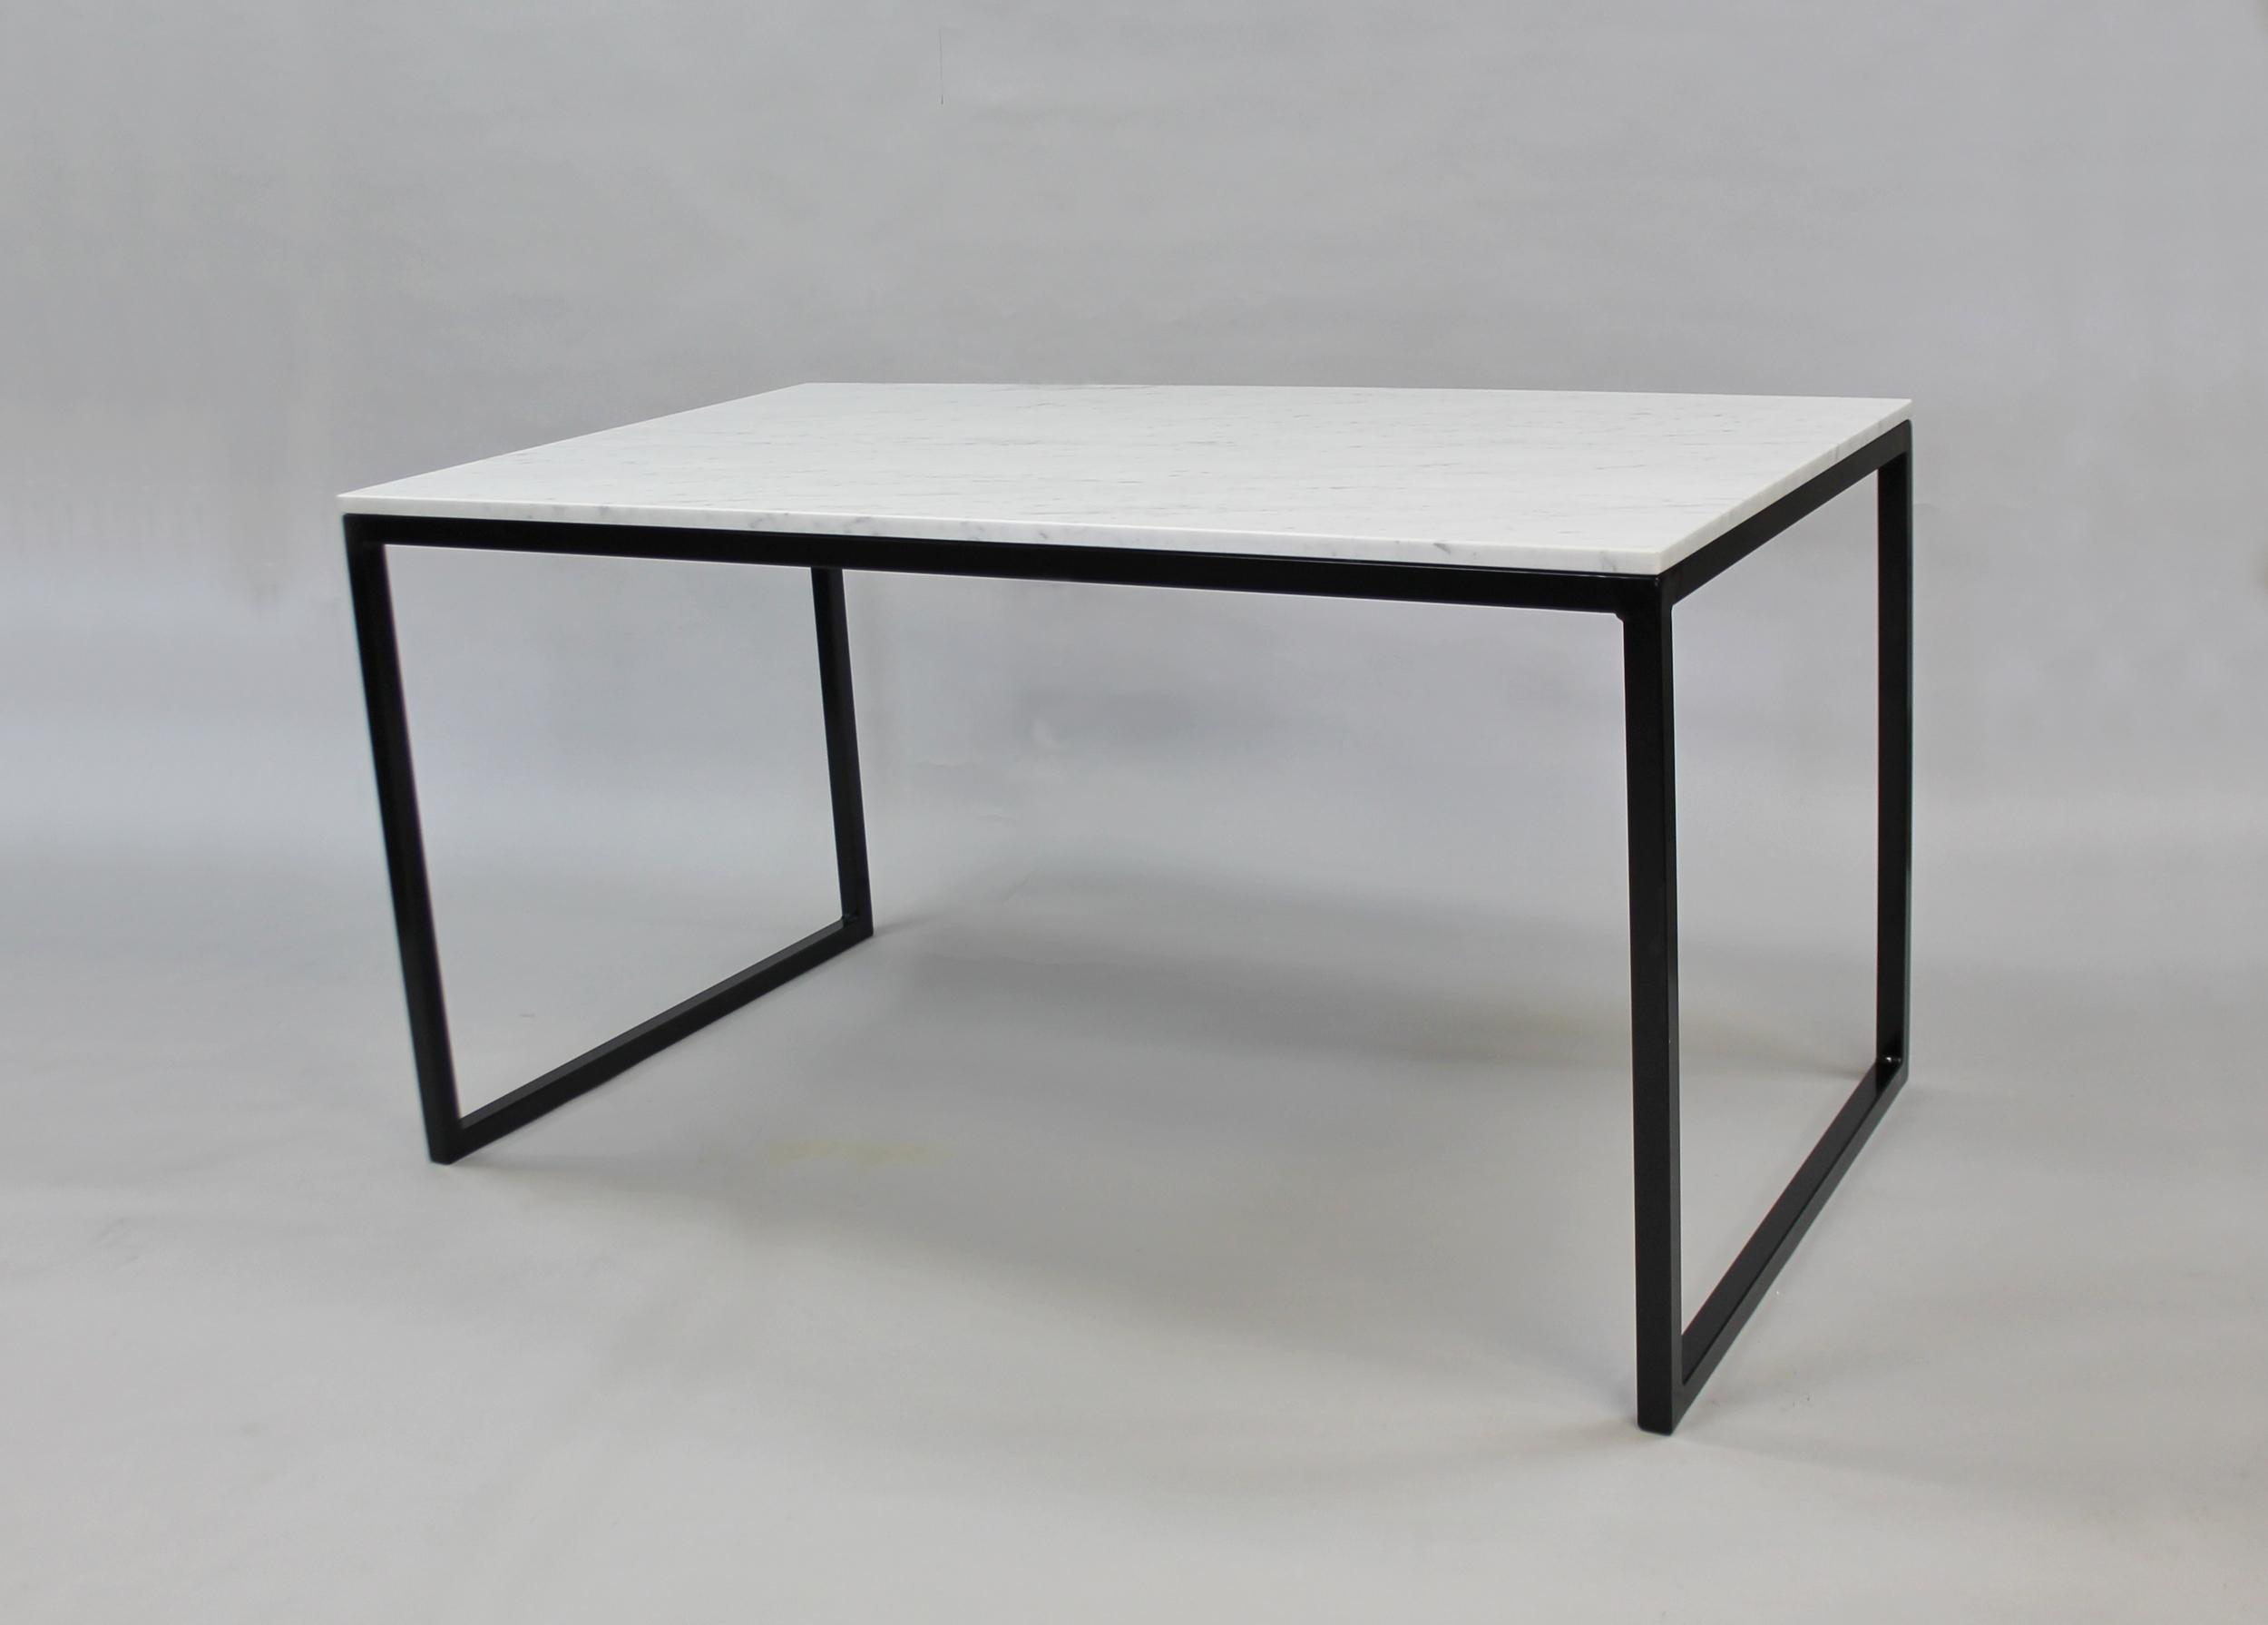 Marmordbord, vit  - 140x80x74 vit marmor svart underrede kub   Pris 10 000:- inkl frakt